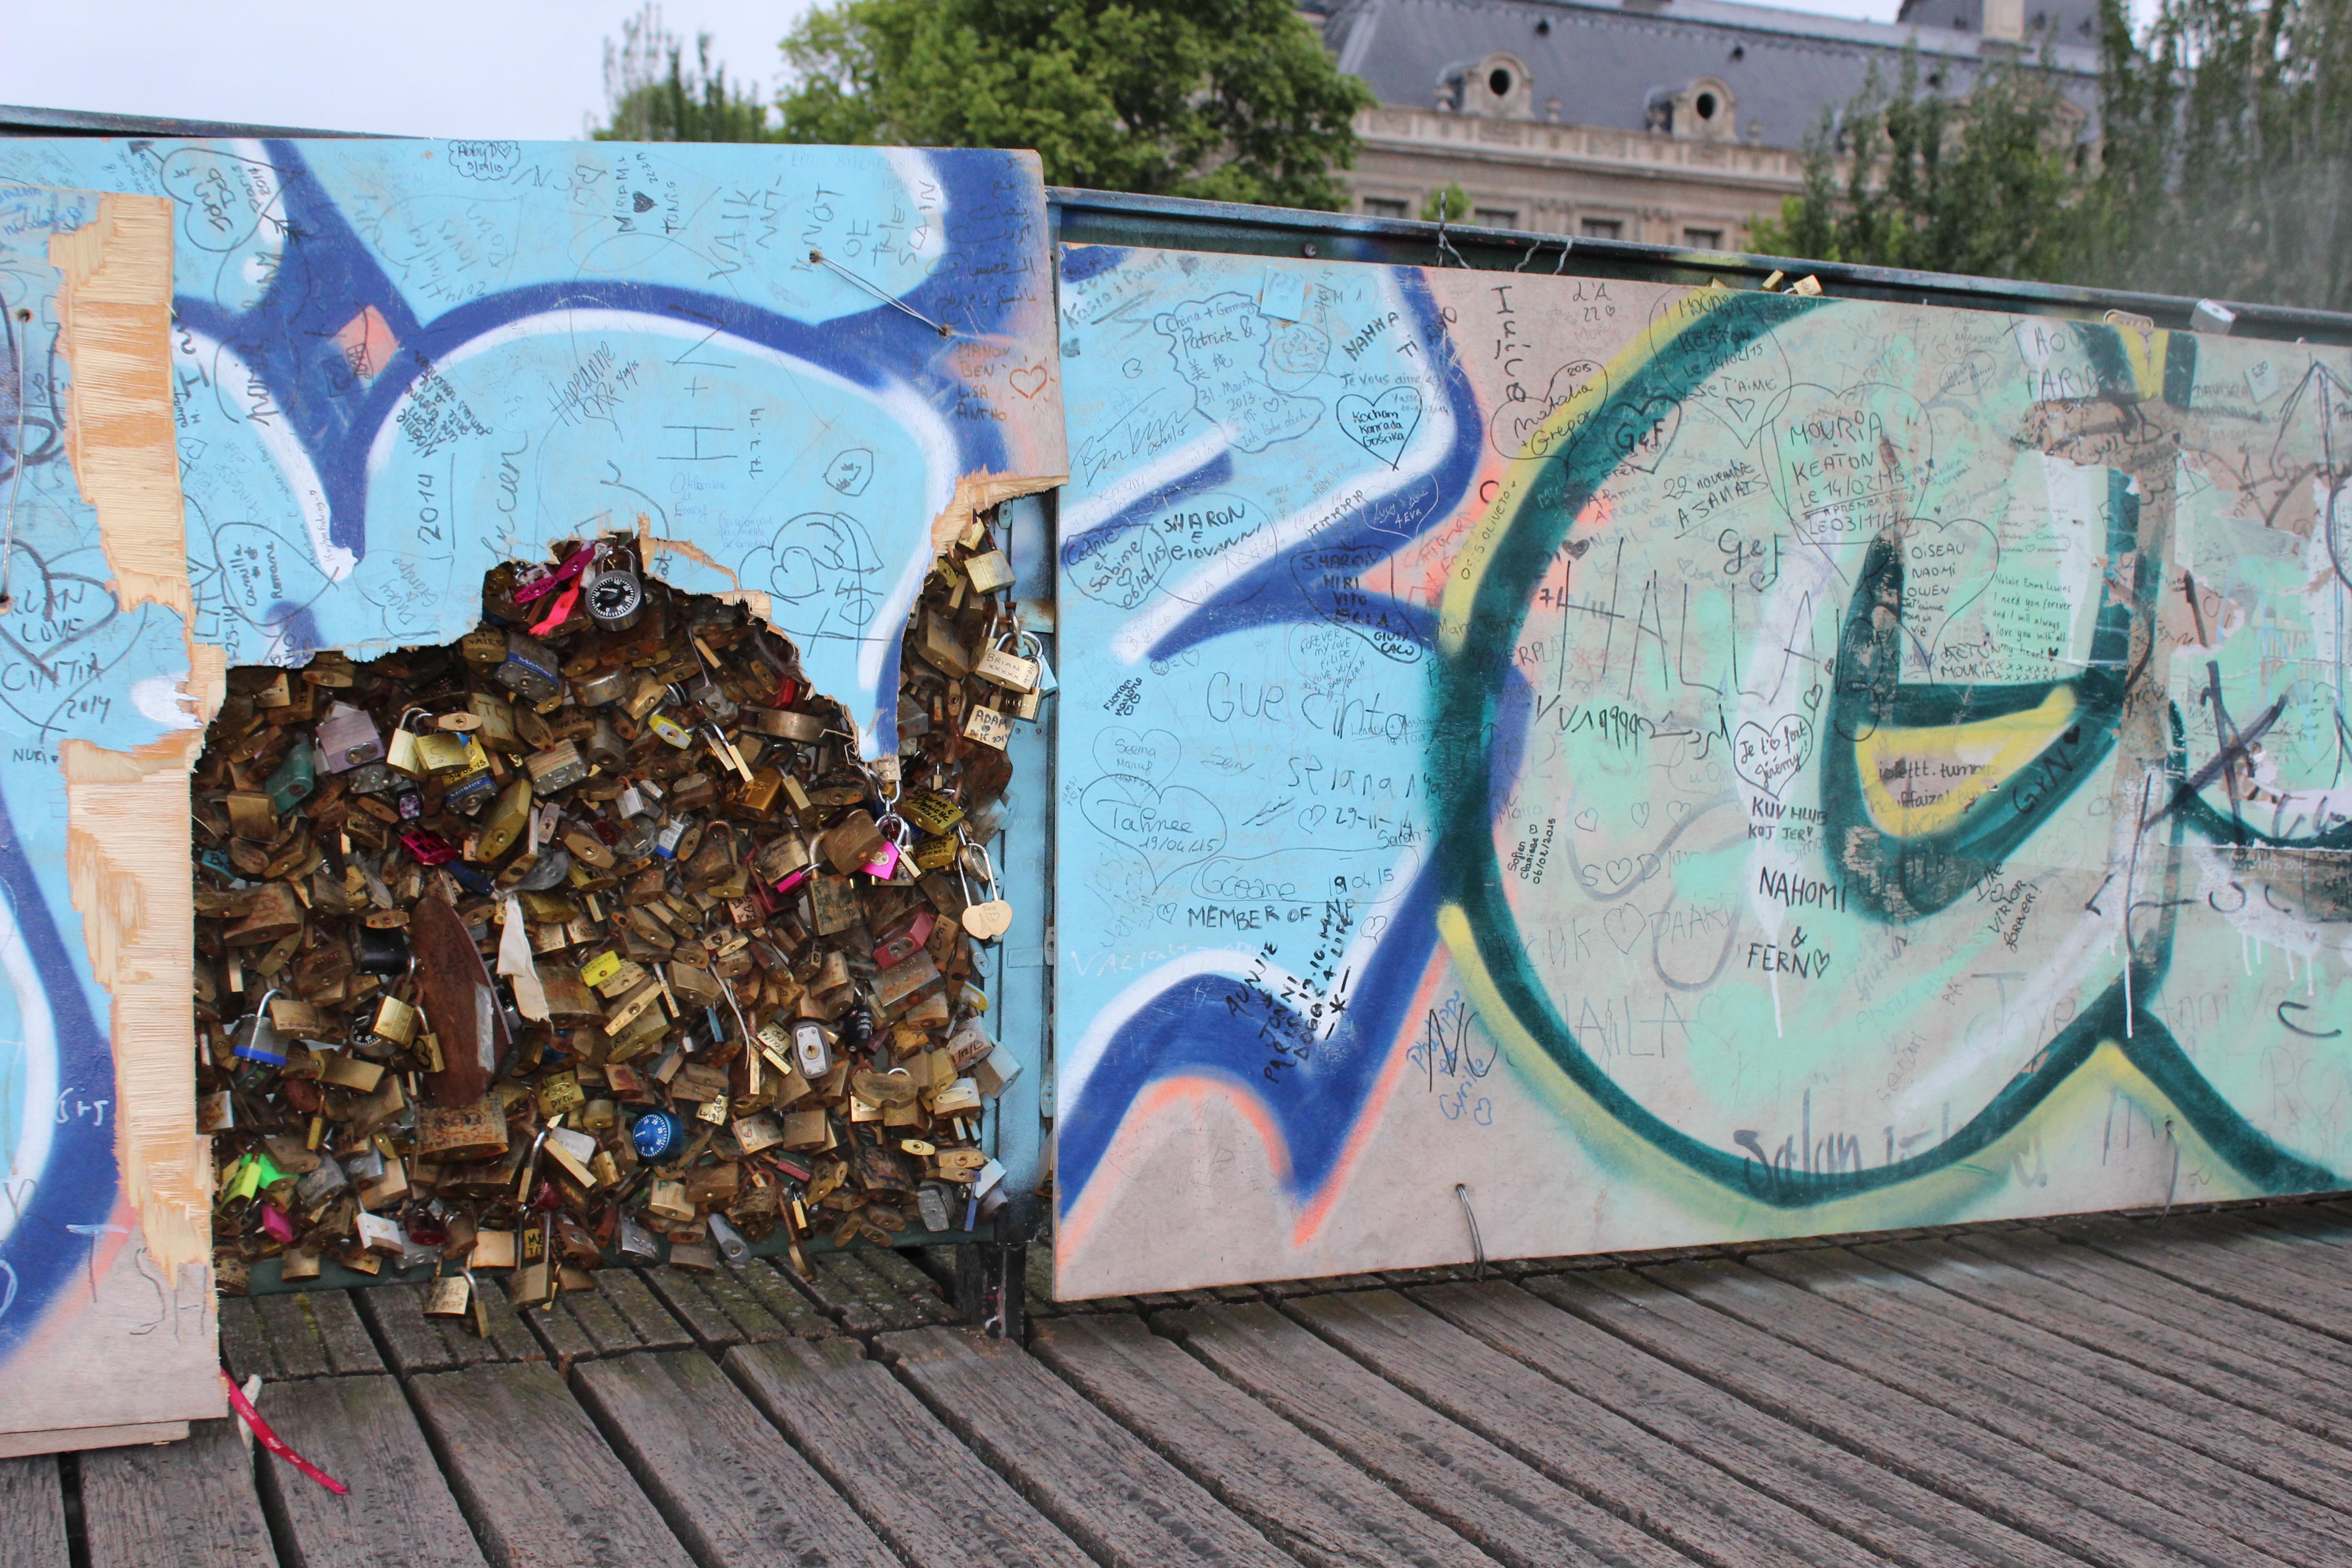 End of street art on the pont des arts